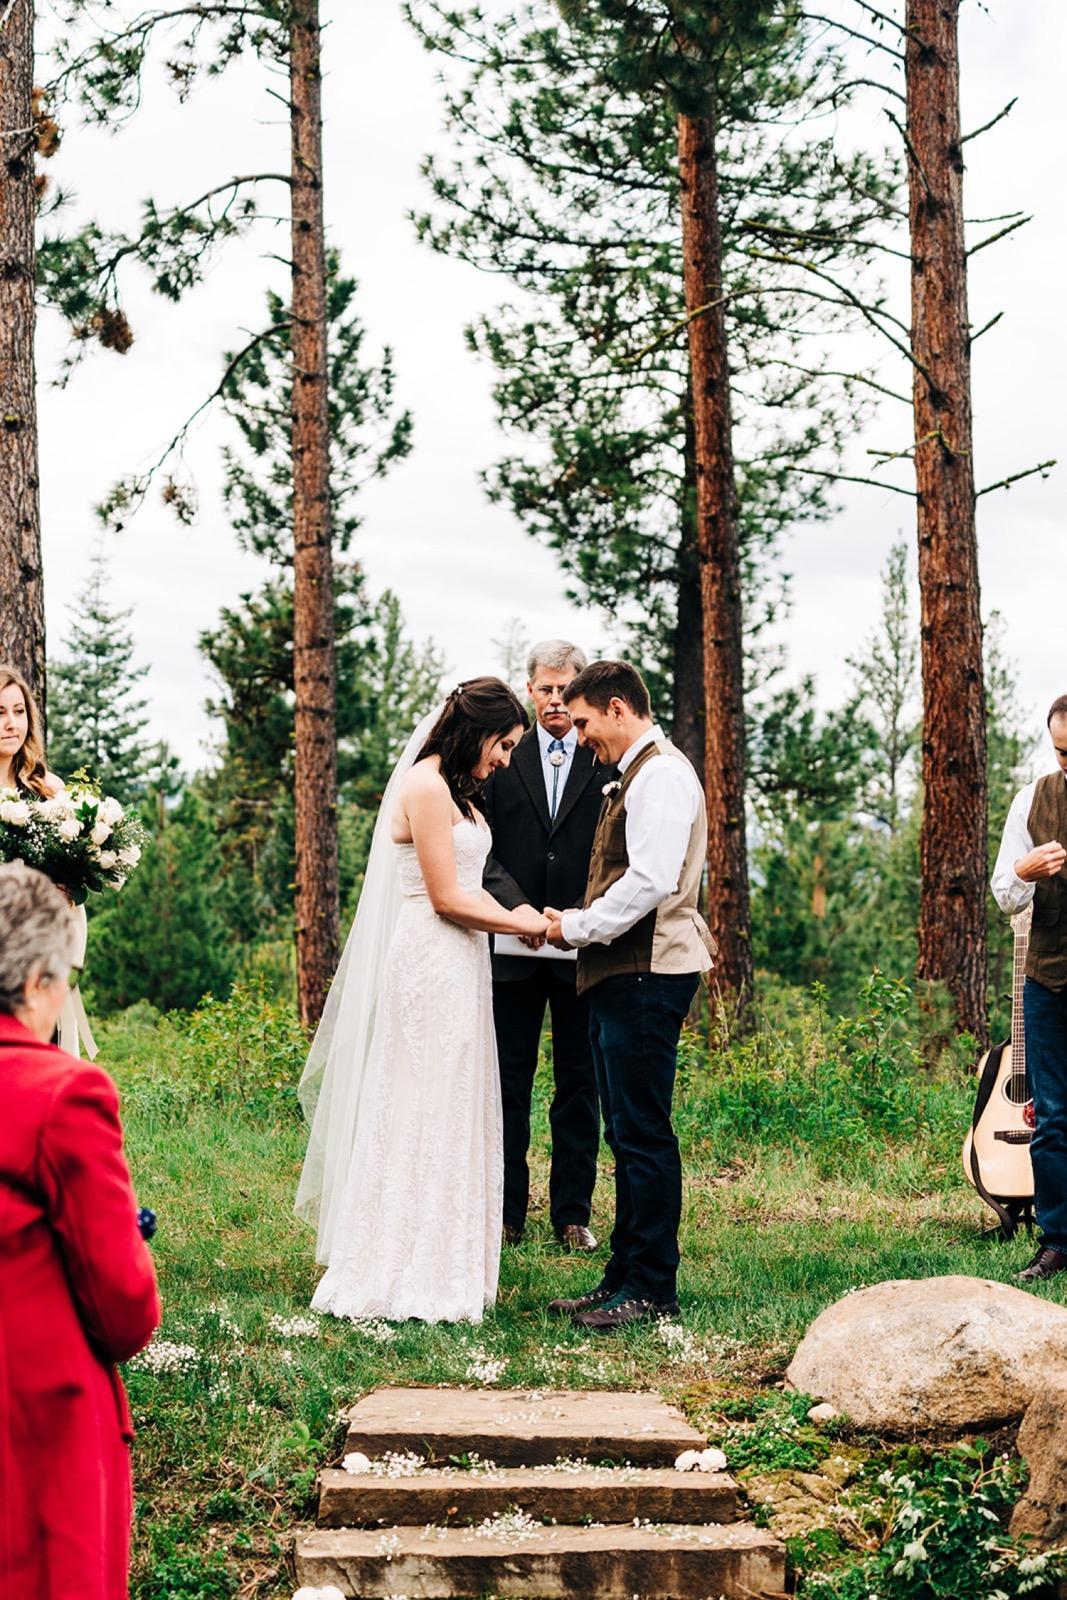 043_katie_chris_wedding-86.jpg